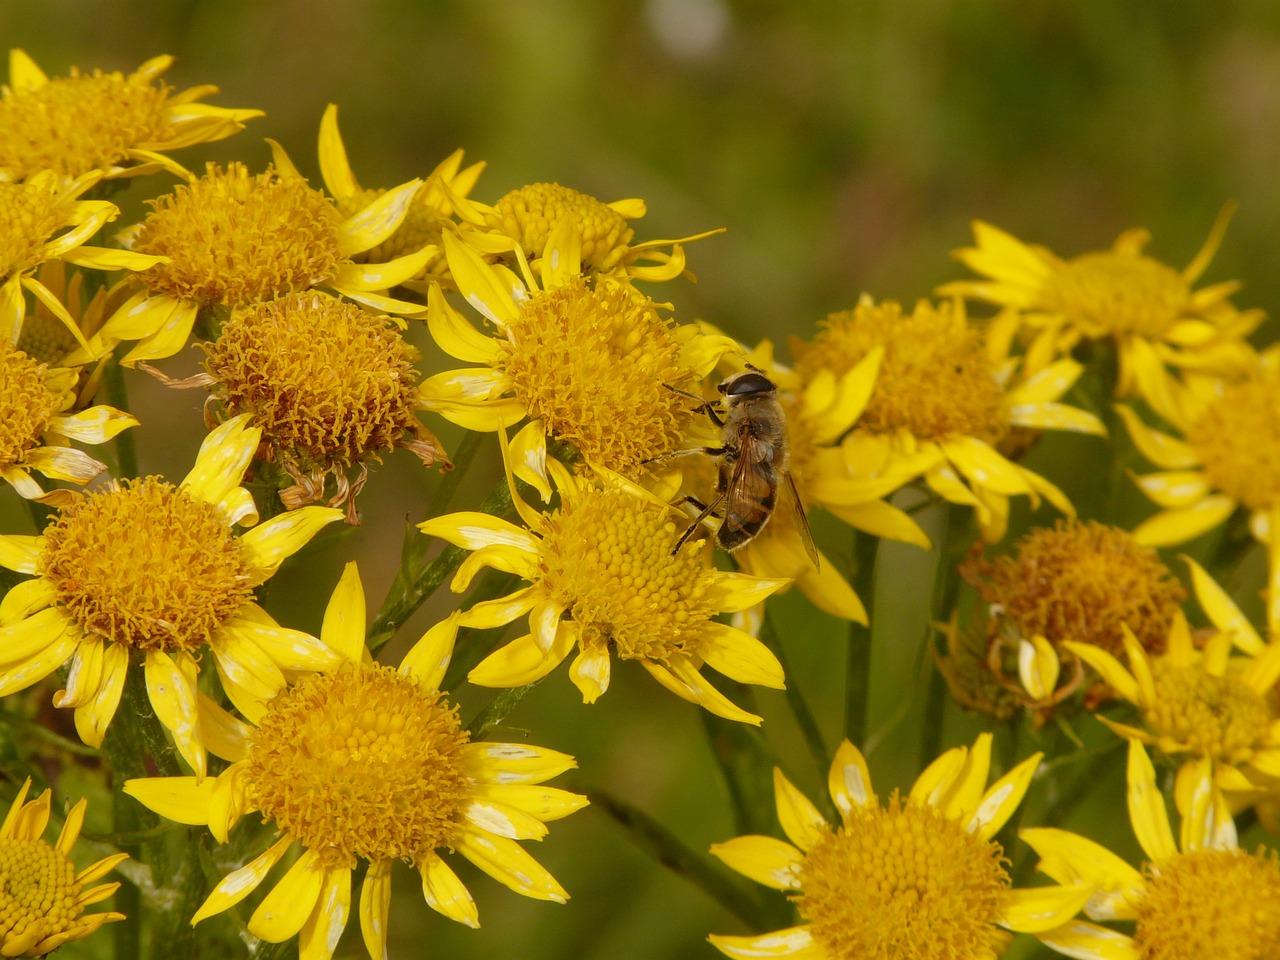 Foto Pixabay - http://pixabay.com/it/arnica-arnica-montana-8897/ api cristina caboni